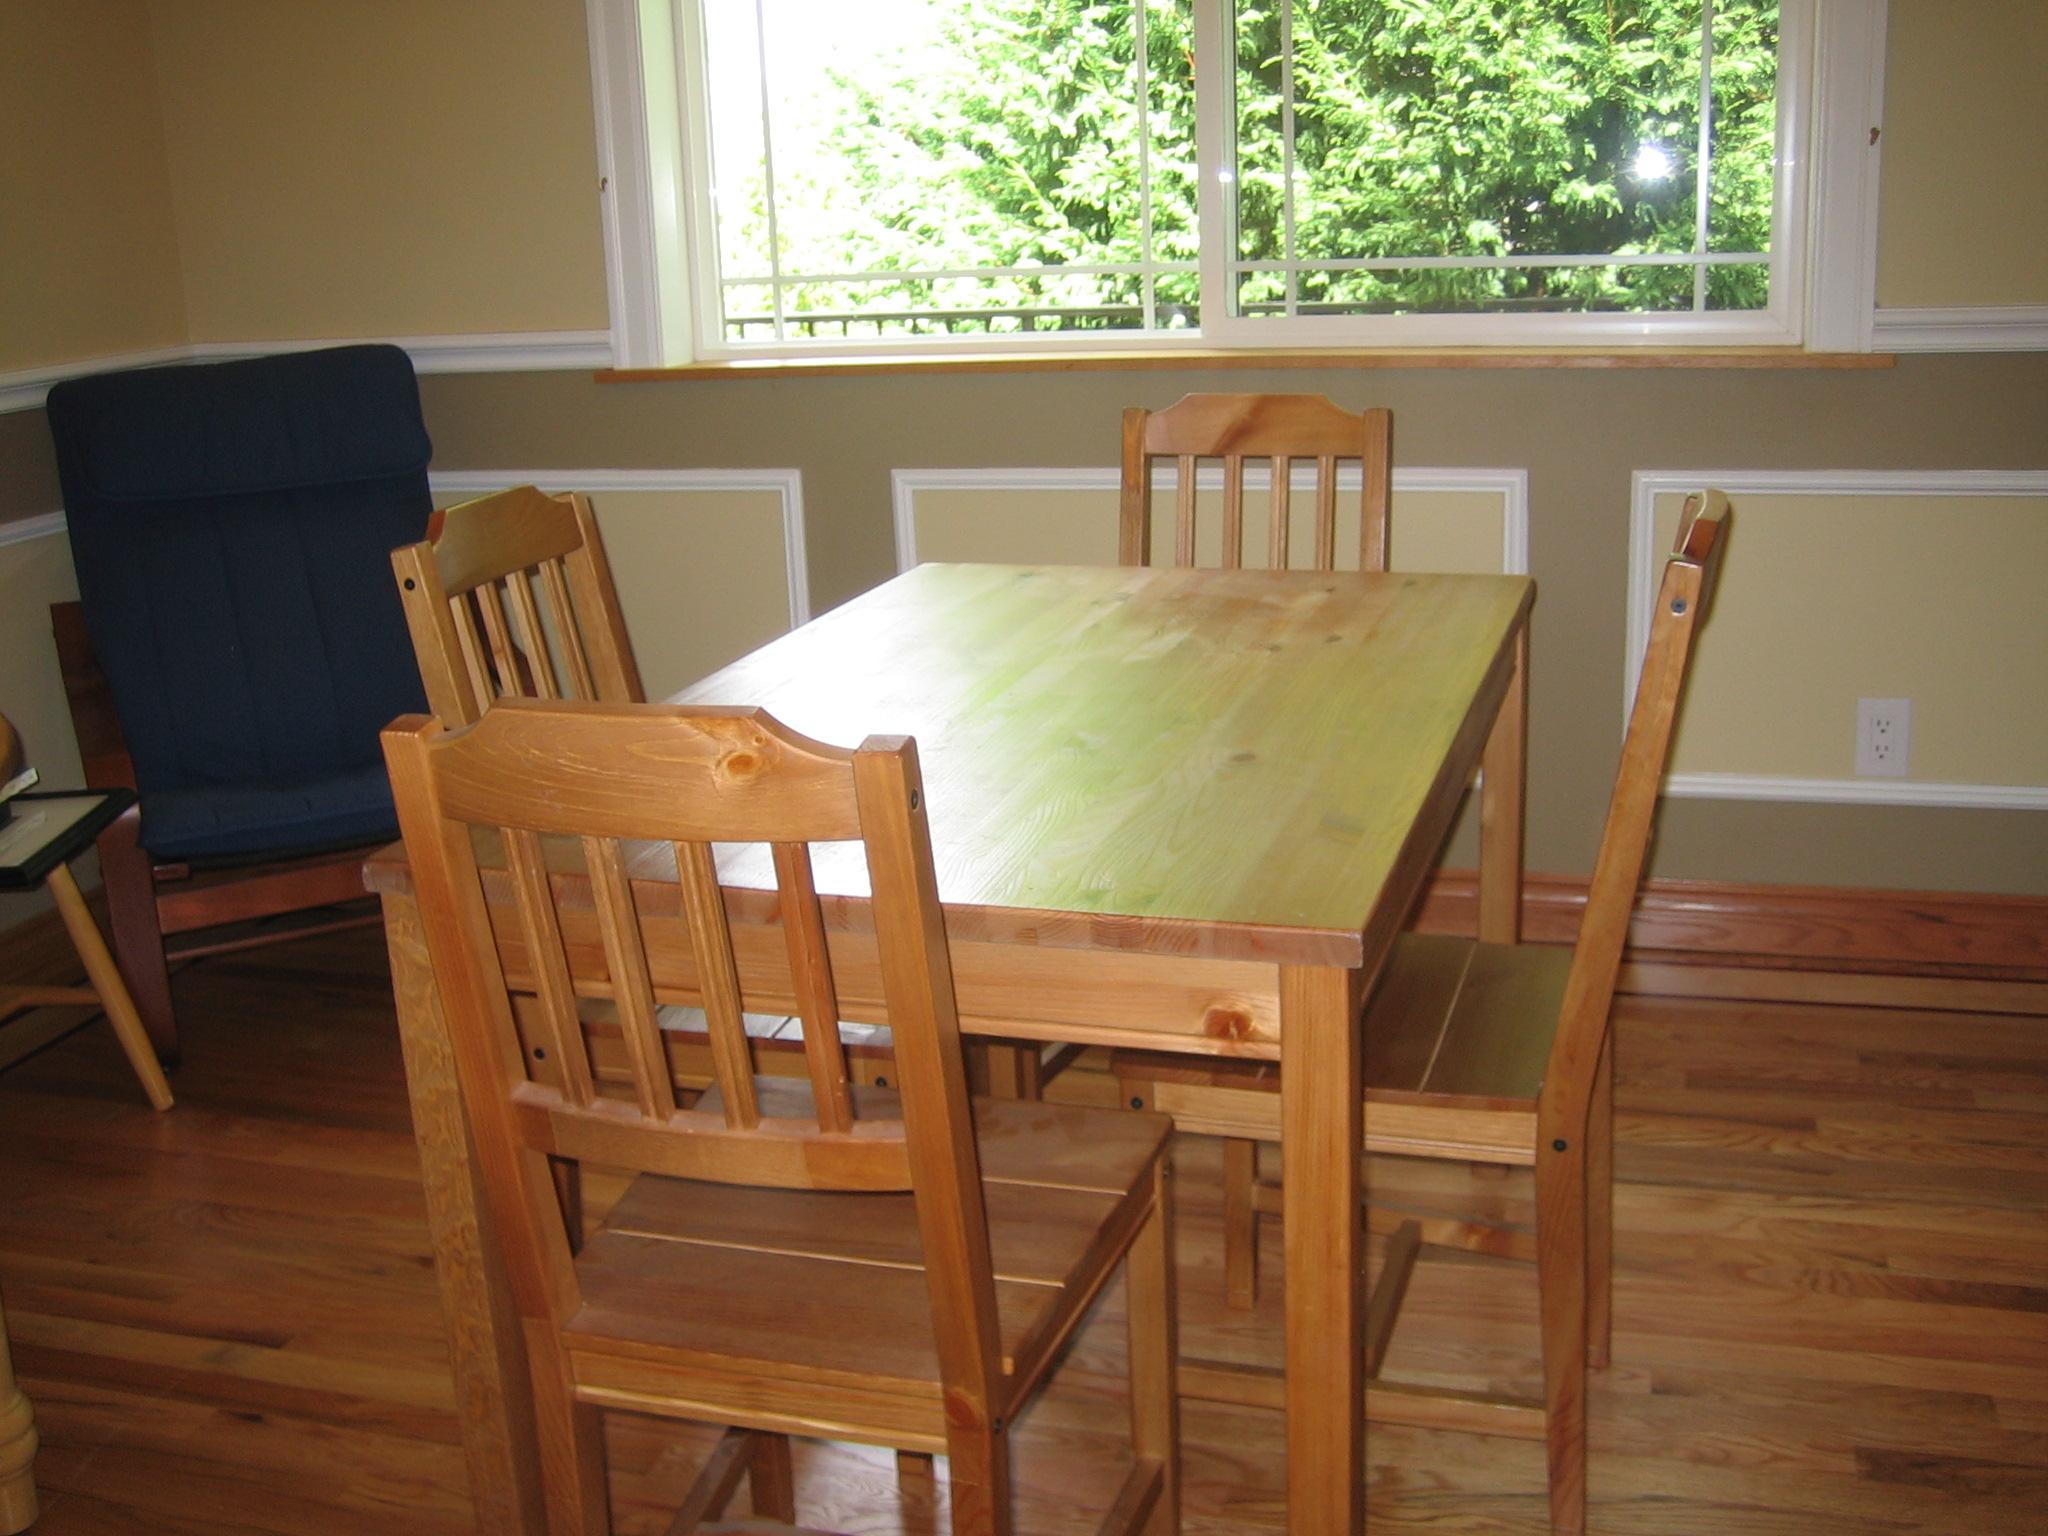 File:Kitchen table.jpg